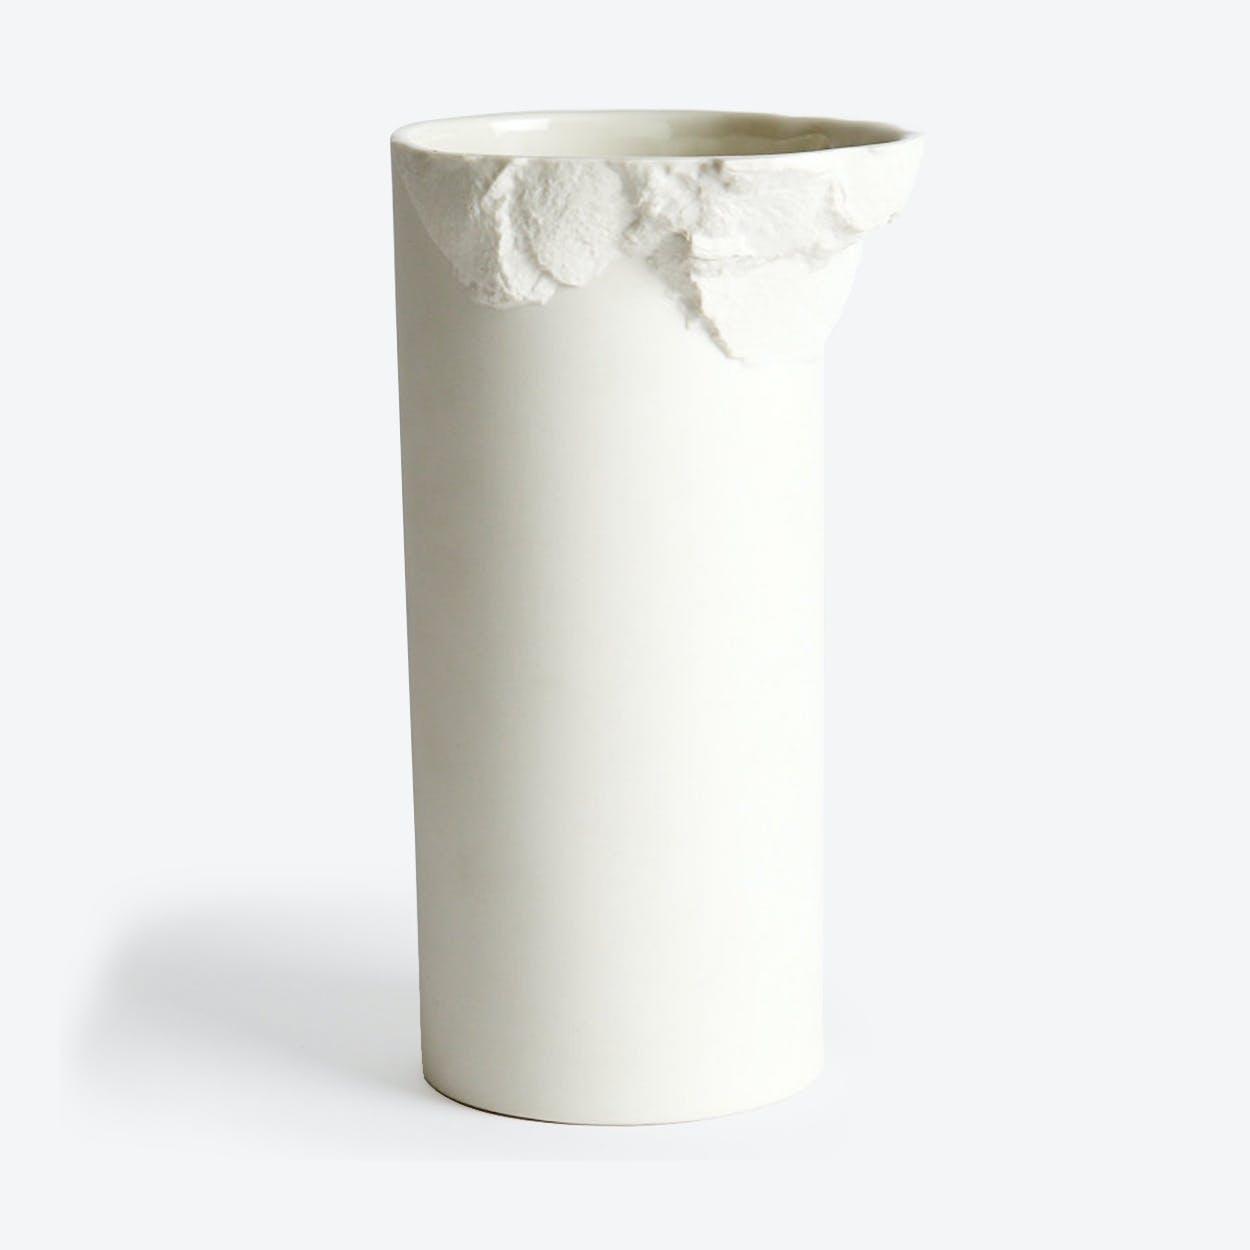 Møns Klint Vase 20 in White Porcelain